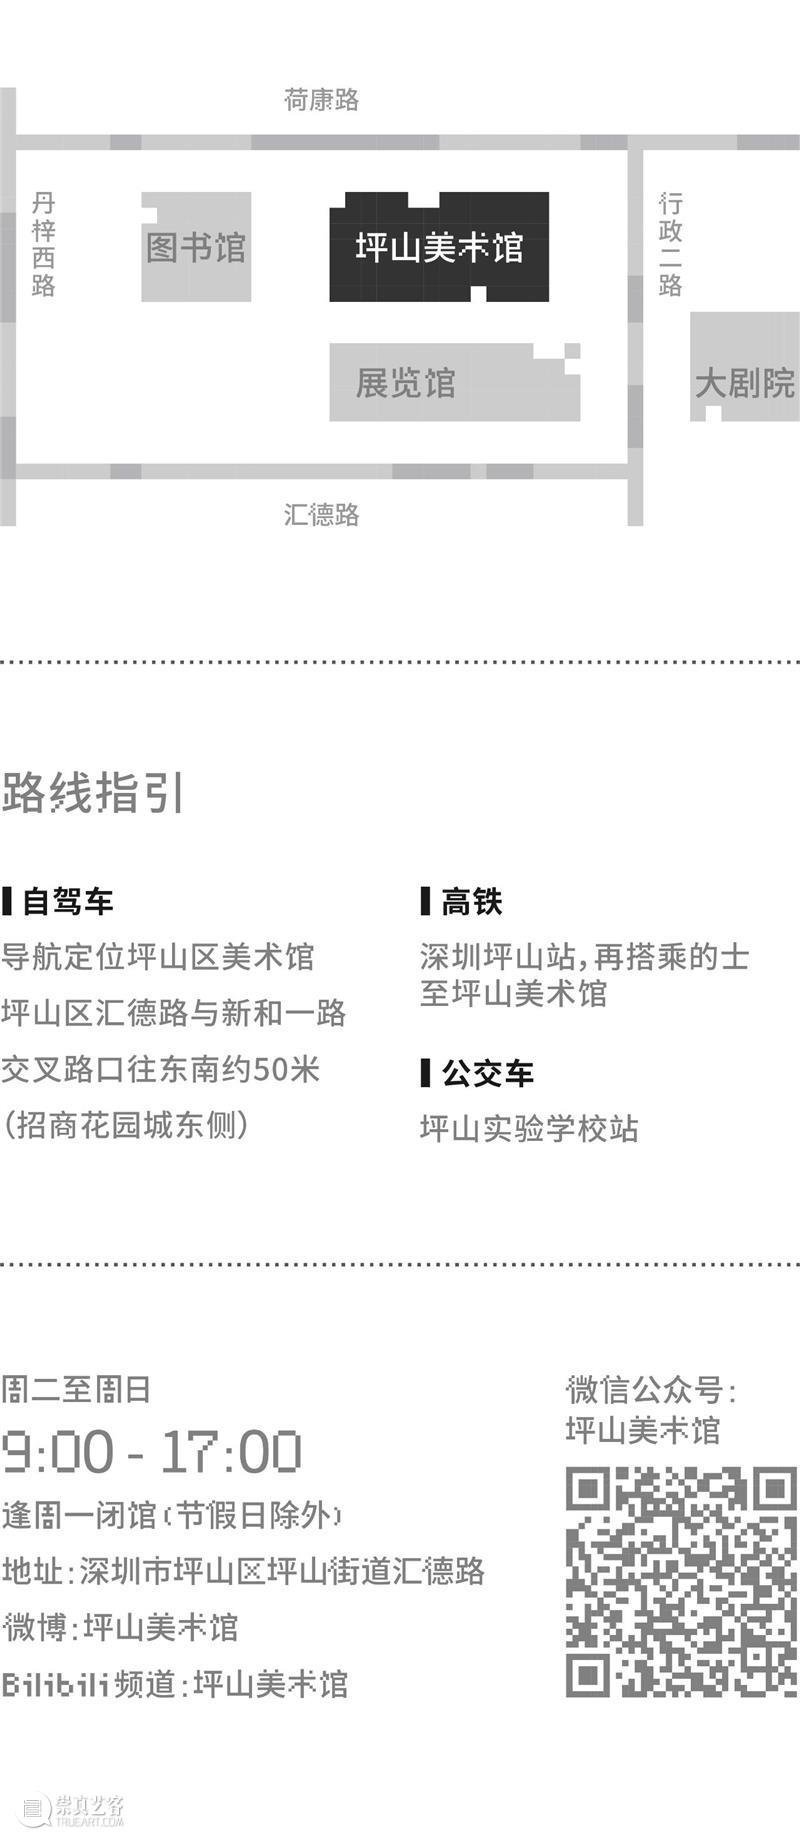 PAM预告 | 另一种观察:档案视野下的中心与地方  坪山美术馆 档案 视野 地方 中心 PAM 坪山美术馆 北京大学 中国 现代 艺术 崇真艺客